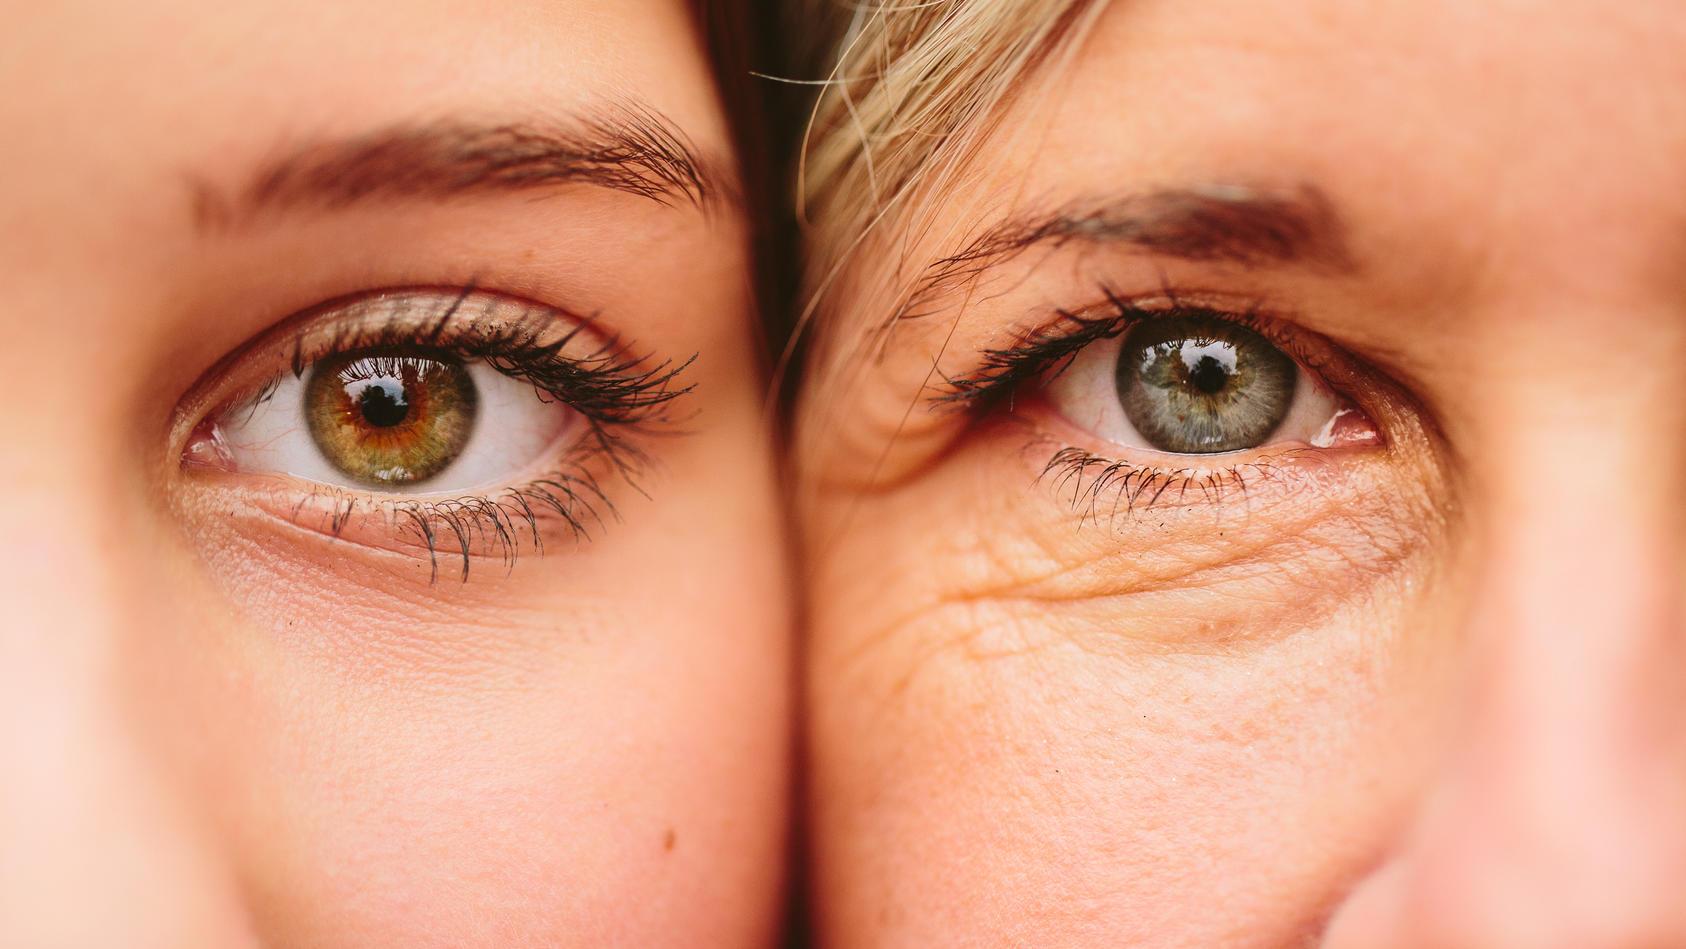 Unser wahres Alter sieht man uns nicht unbedingt an.